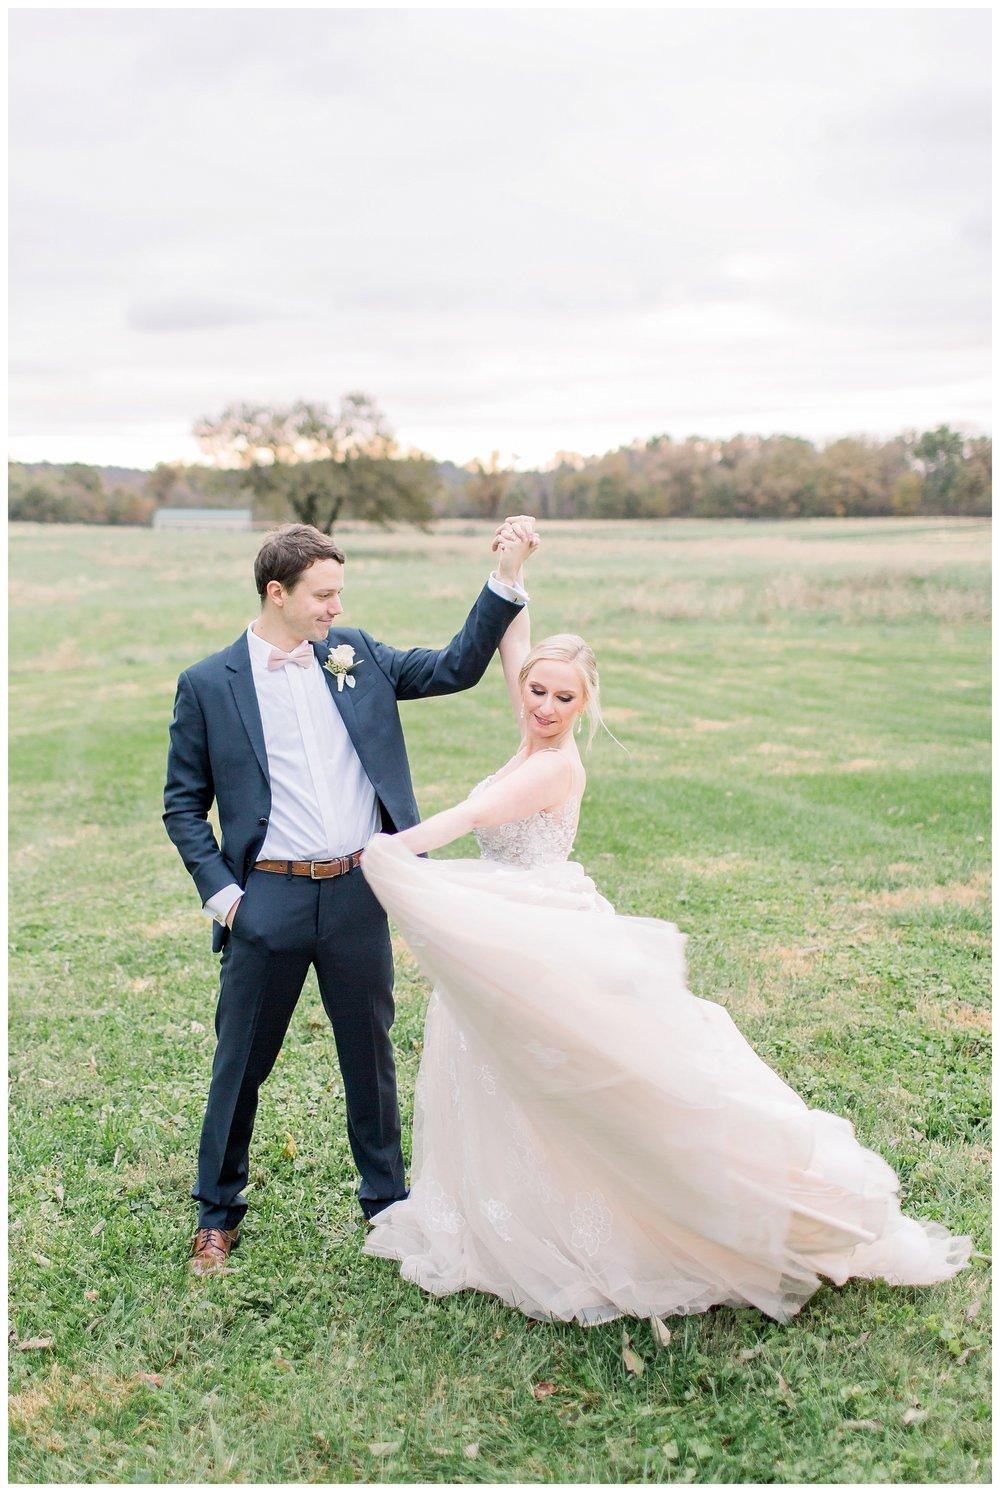 Whitehall Estate Wedding | Northern Virginia Wedding Photographer Kir Tuben_0087.jpg